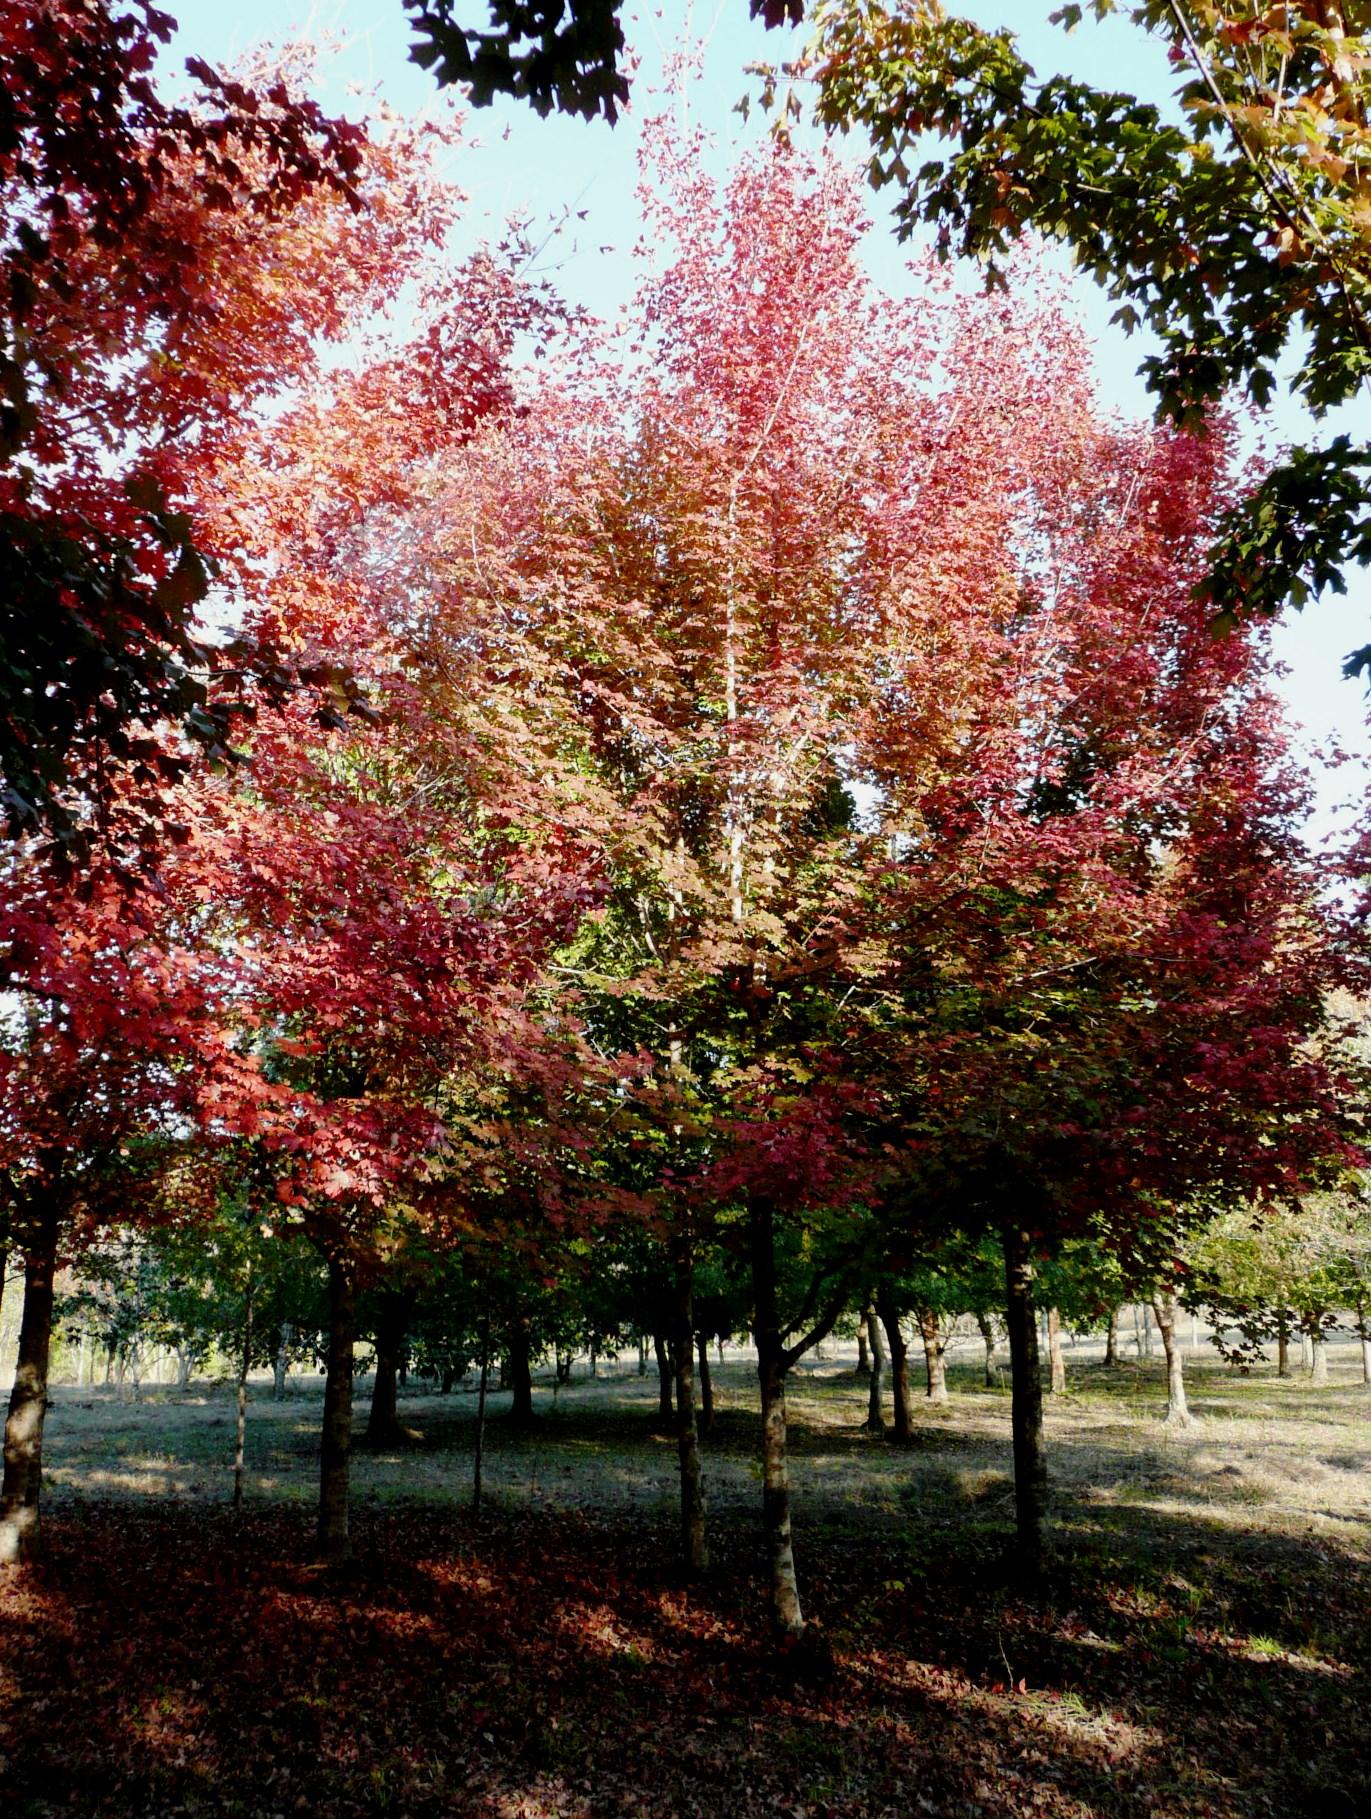 Dwarf ornamental trees for landscaping - Louisiana Has Great Landscape Trees